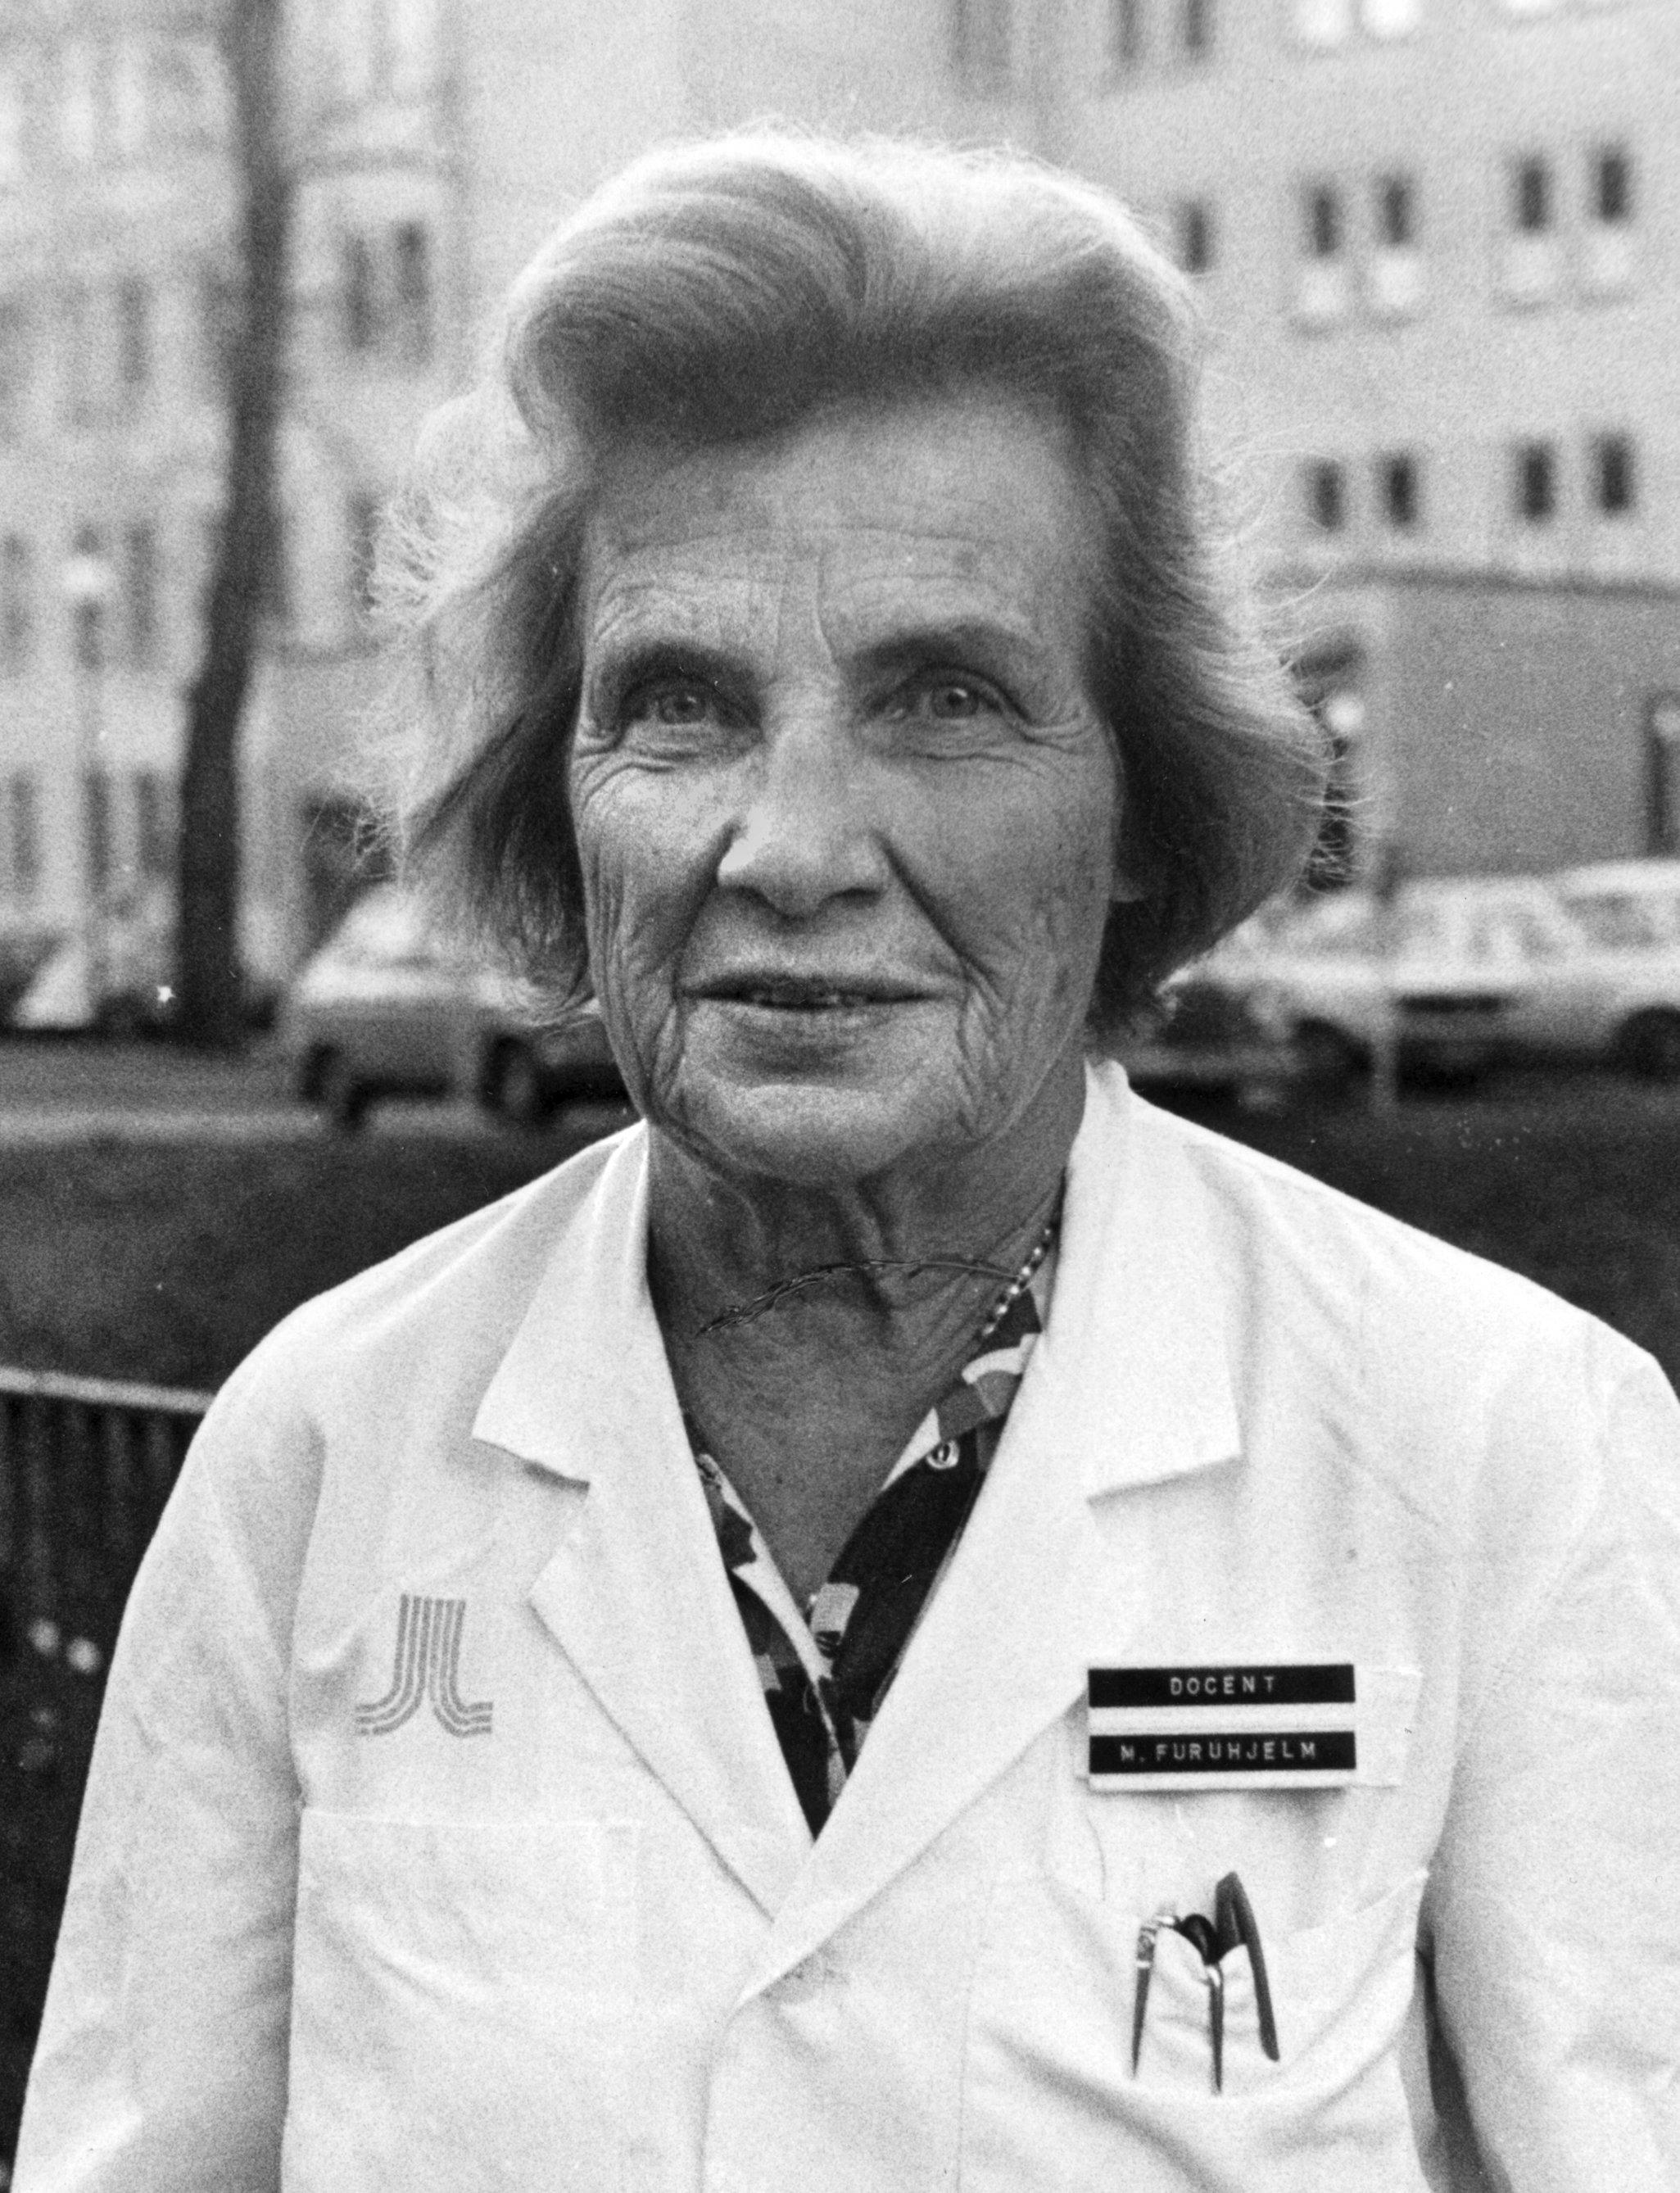 Mirjam Furuhjelm, 1975. Photo: Leif R Jansson (TT)